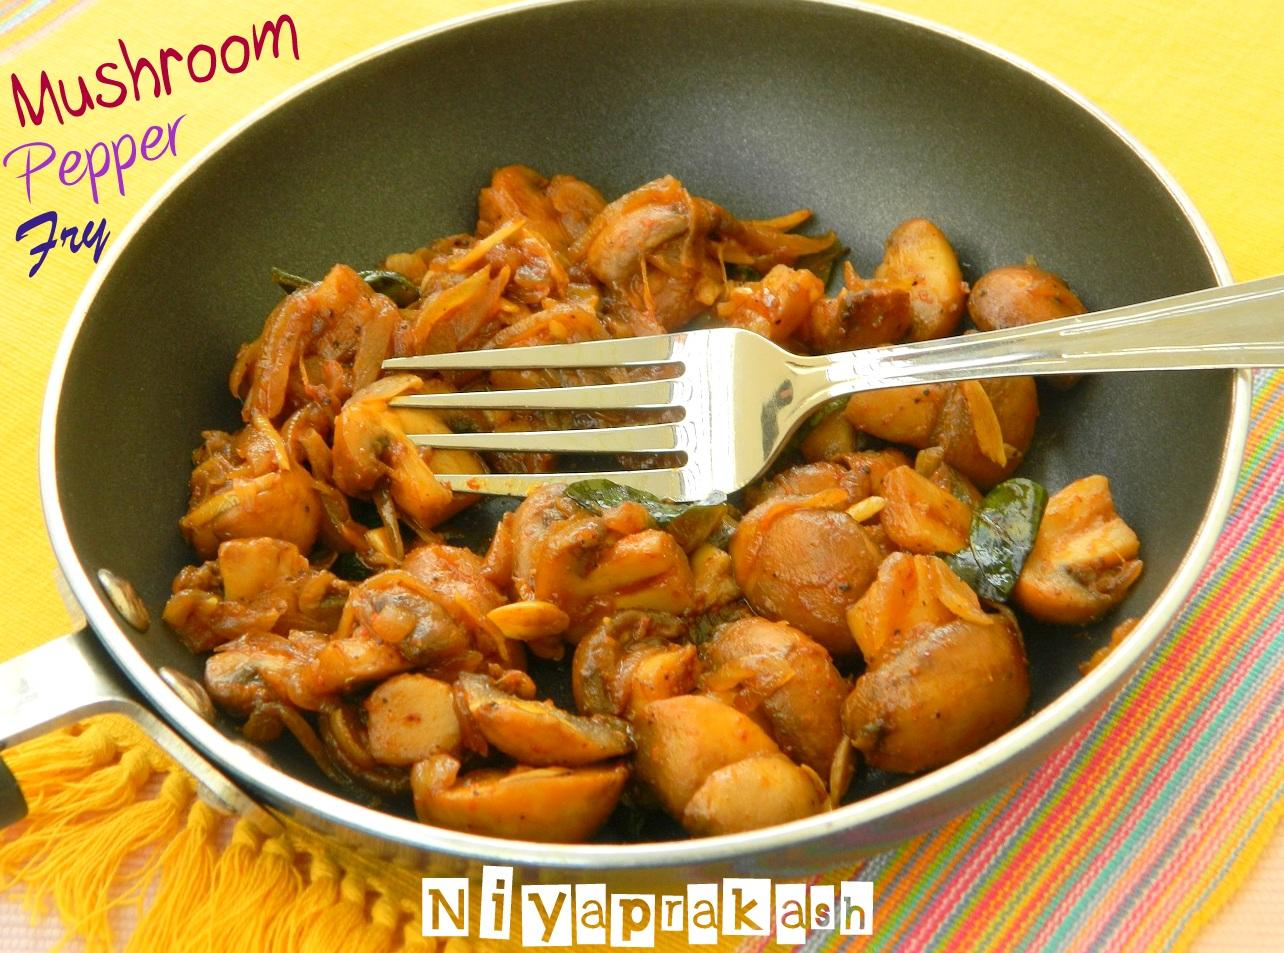 ... mushroom pepper fry 1 mushroom pepper fry recipe pepper mushroom fry 4